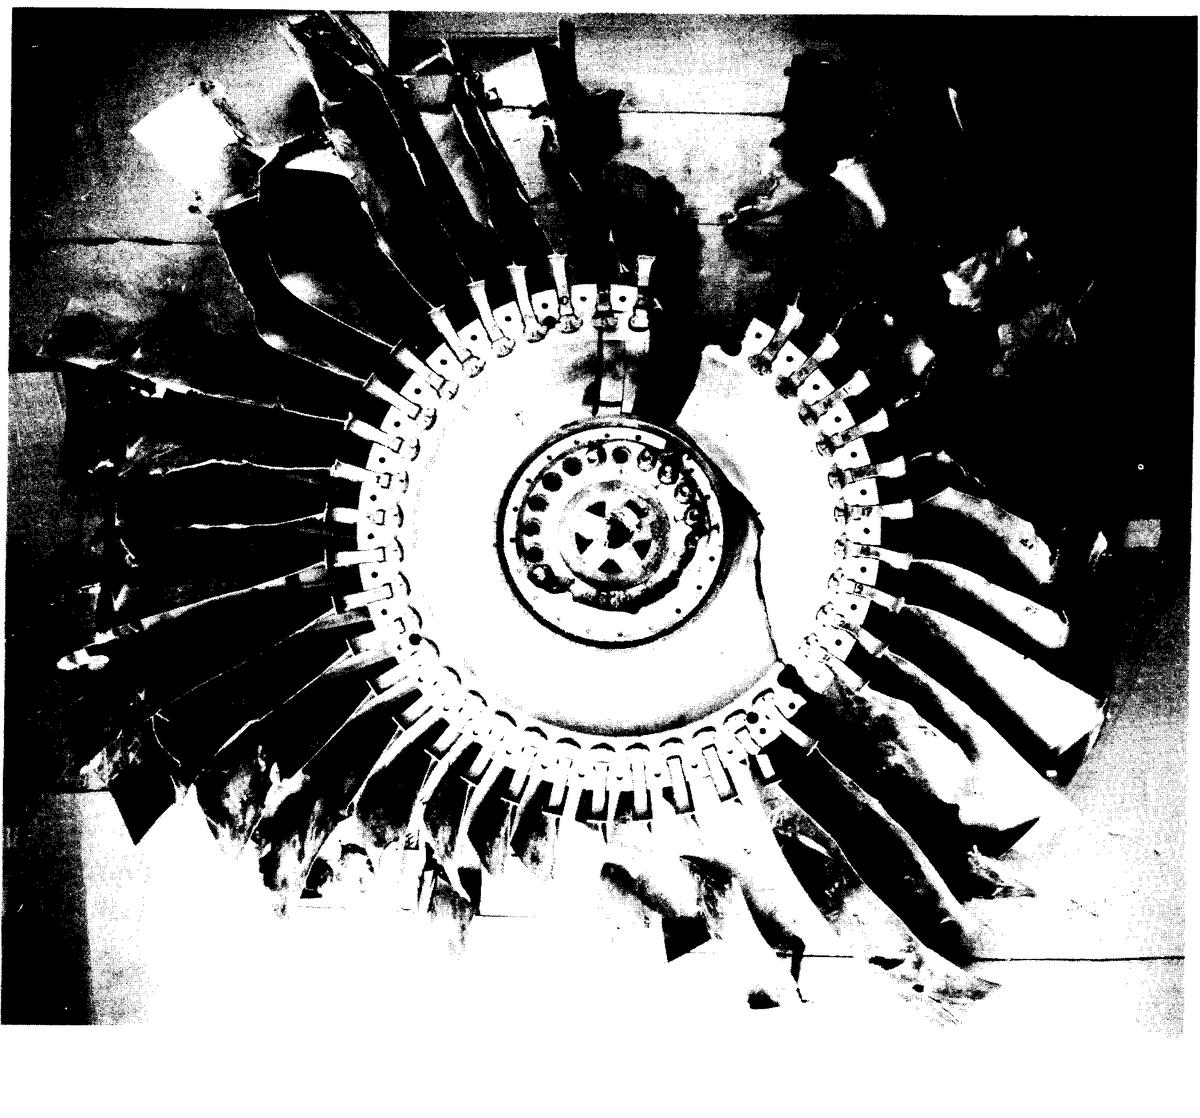 Turbine engine failure - Wikipedia